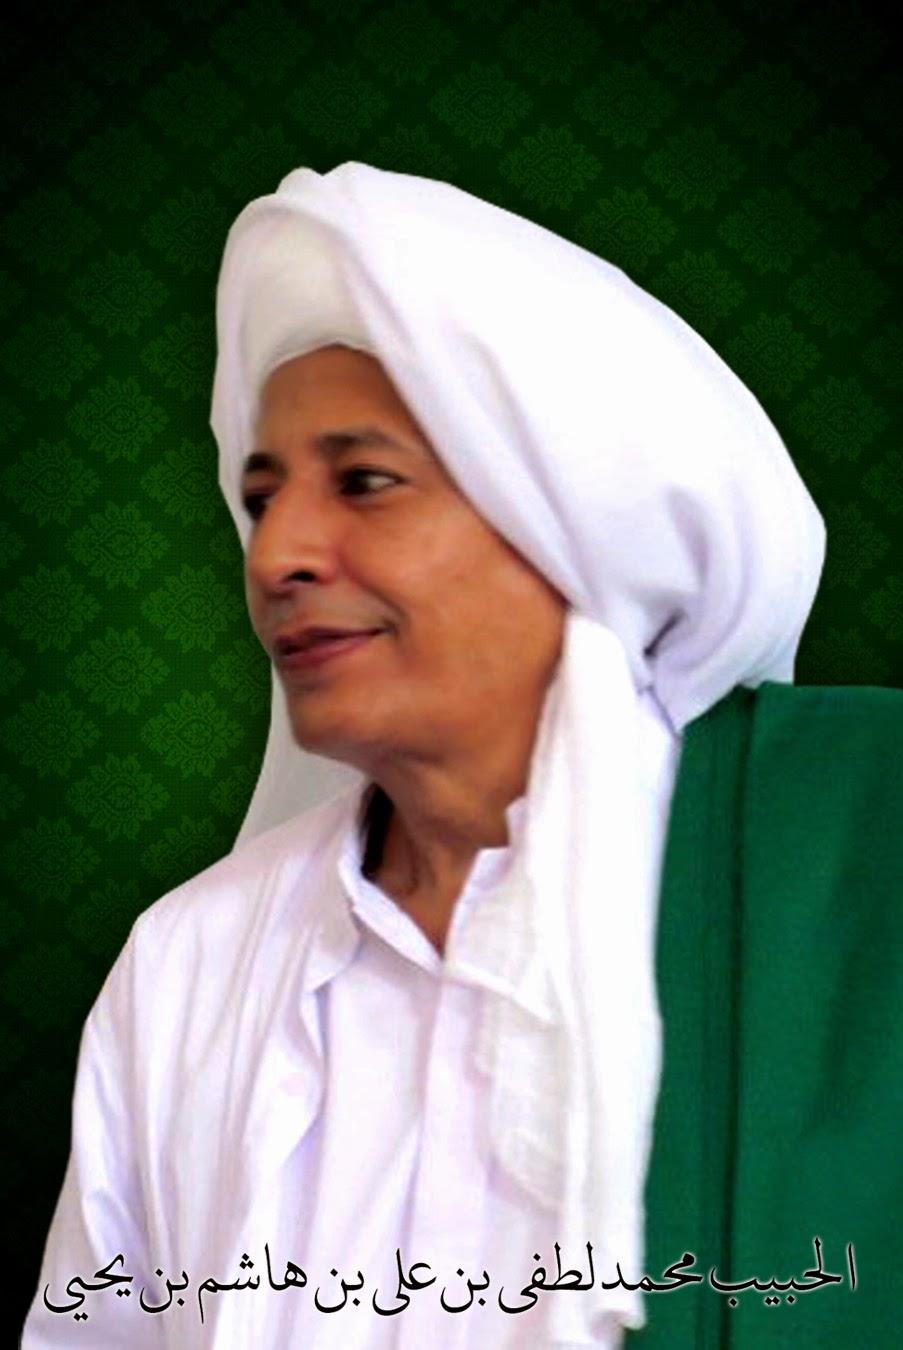 Habib Muhammad bin Yahya Hijau